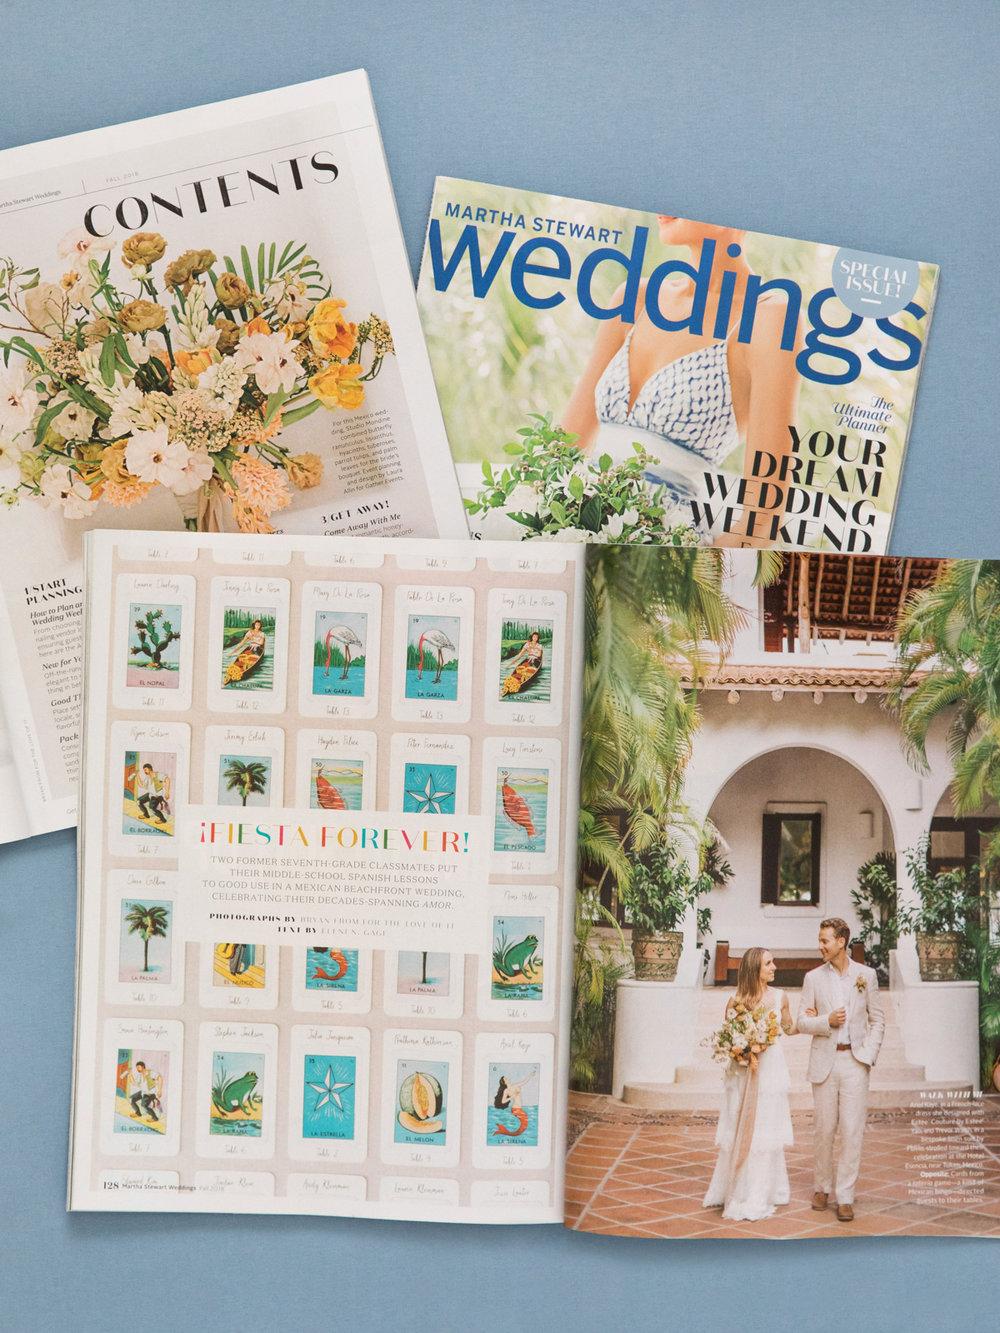 Hotel Esencia Tulum Wedding Martha Stewart Parachute Home-001.jpg